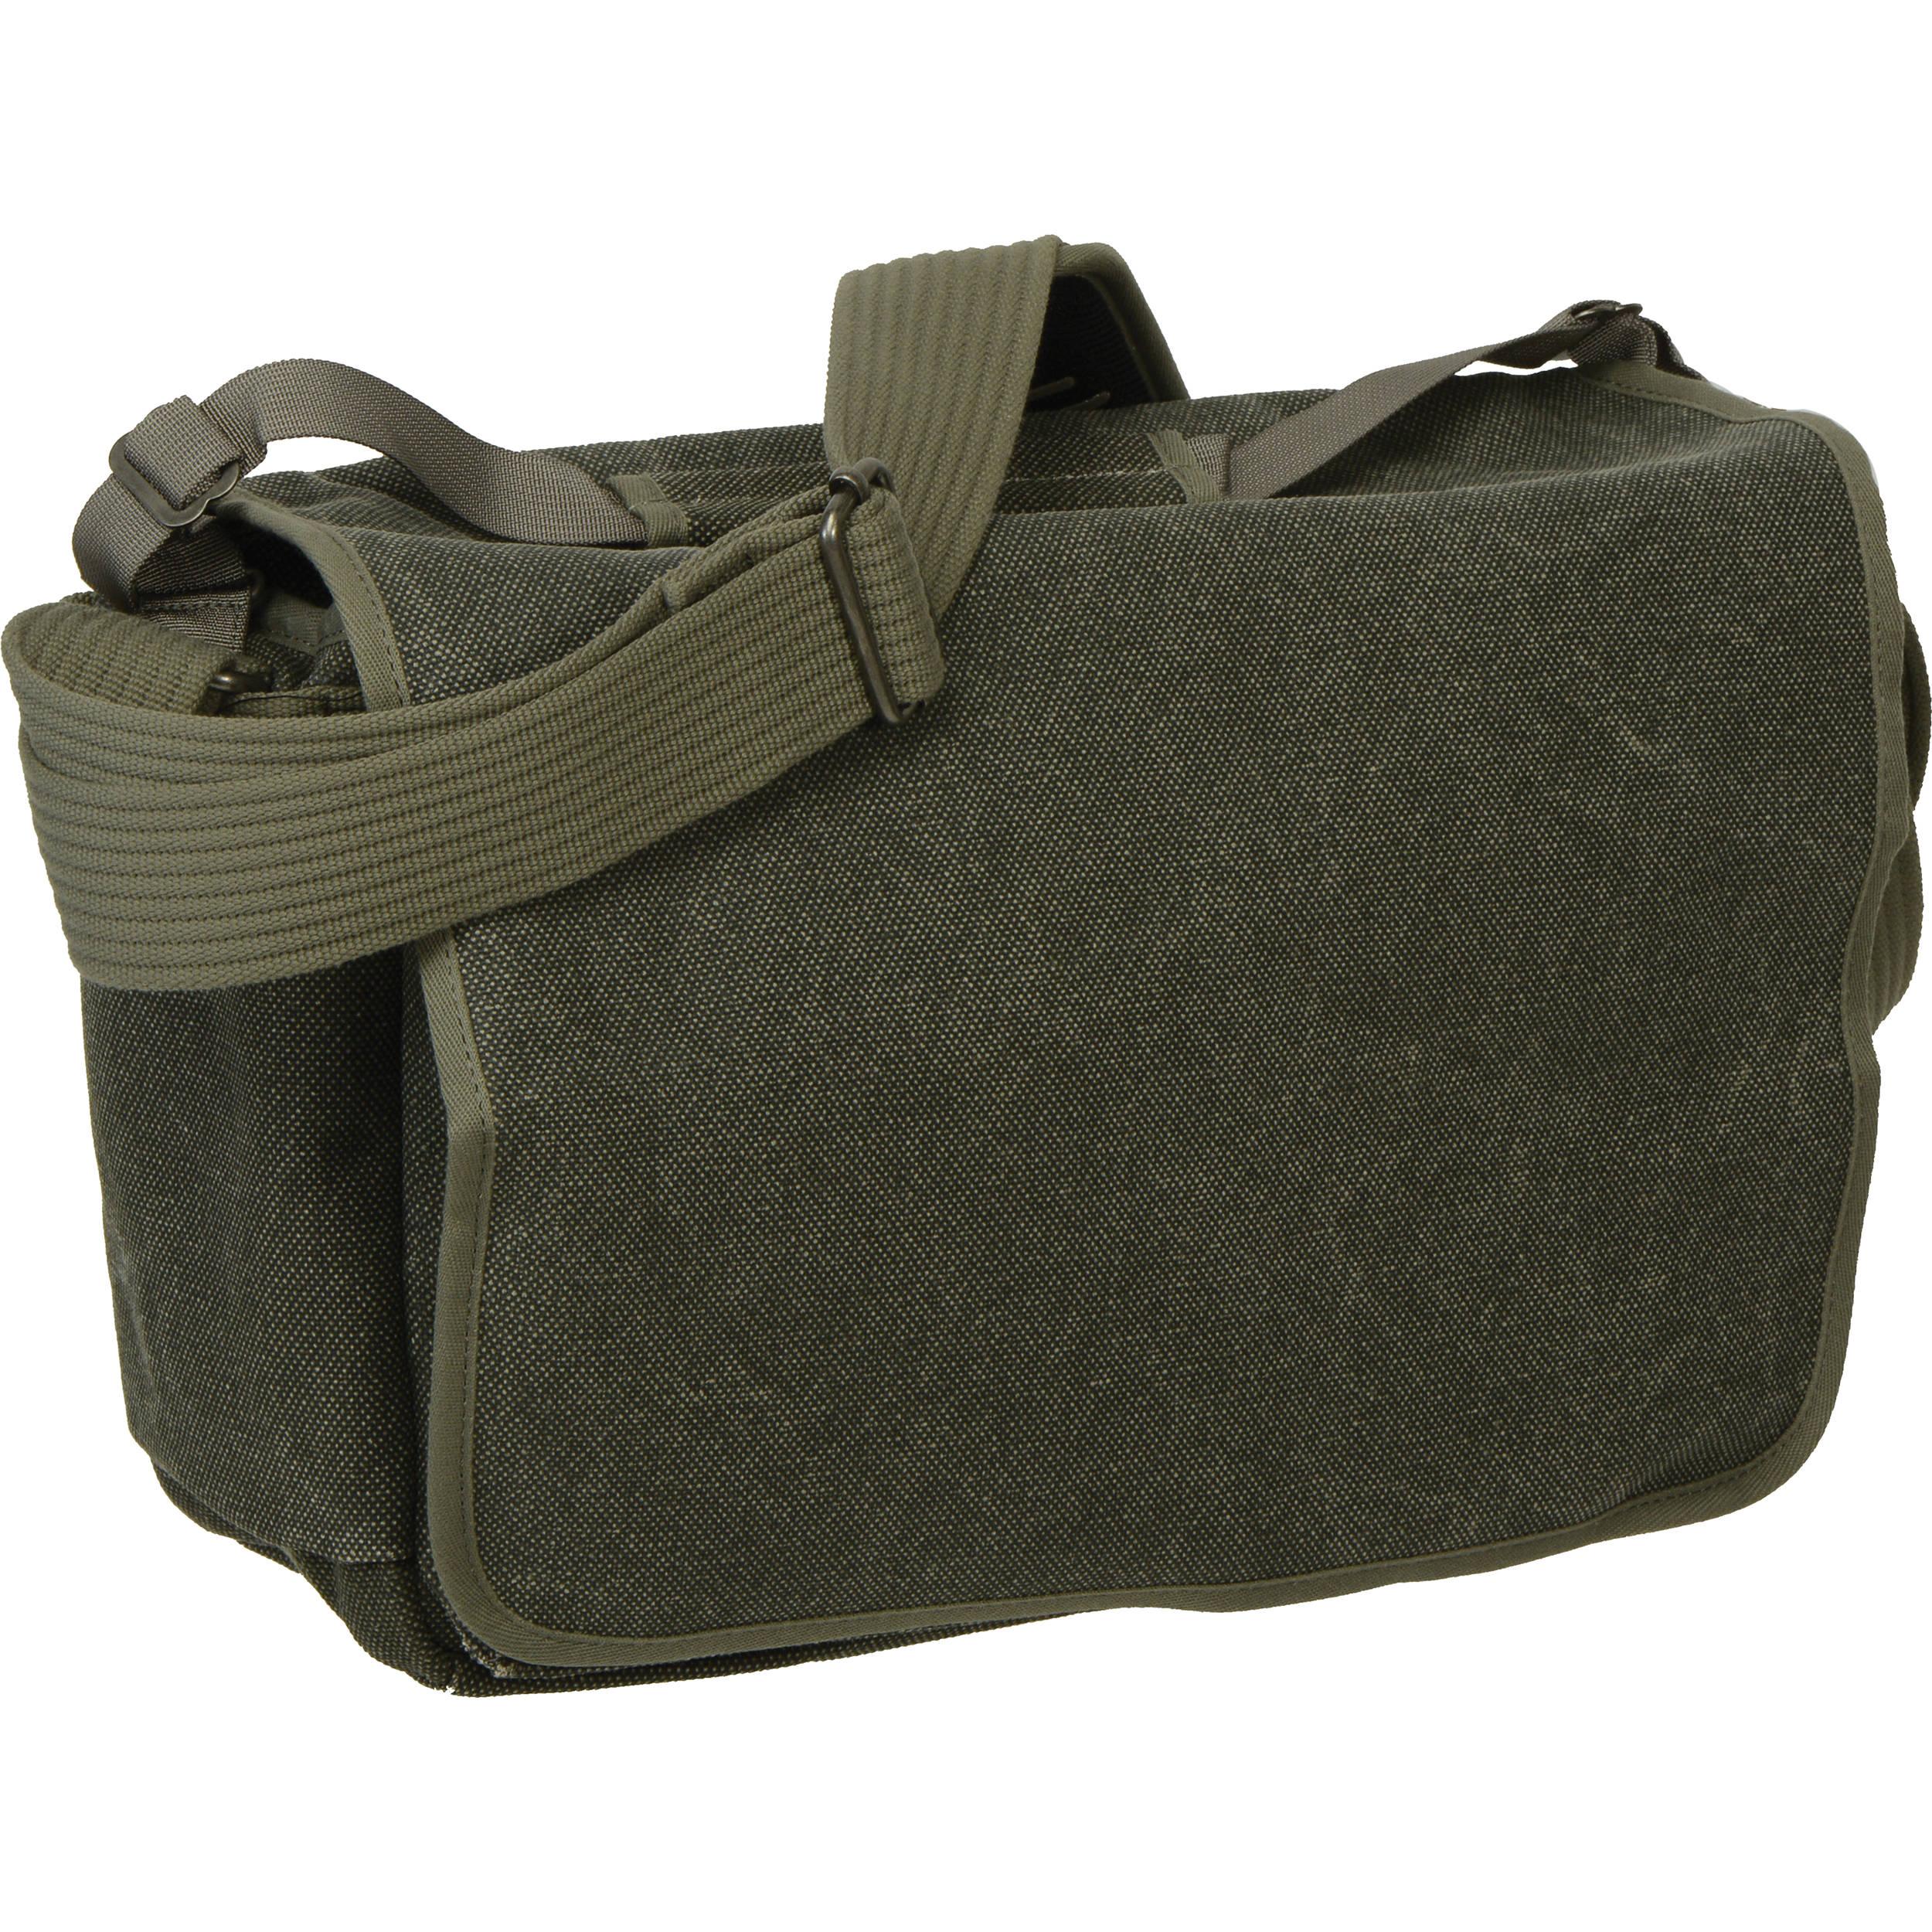 Think Tank Retrospective 30 Small Shoulder Bag Black 63